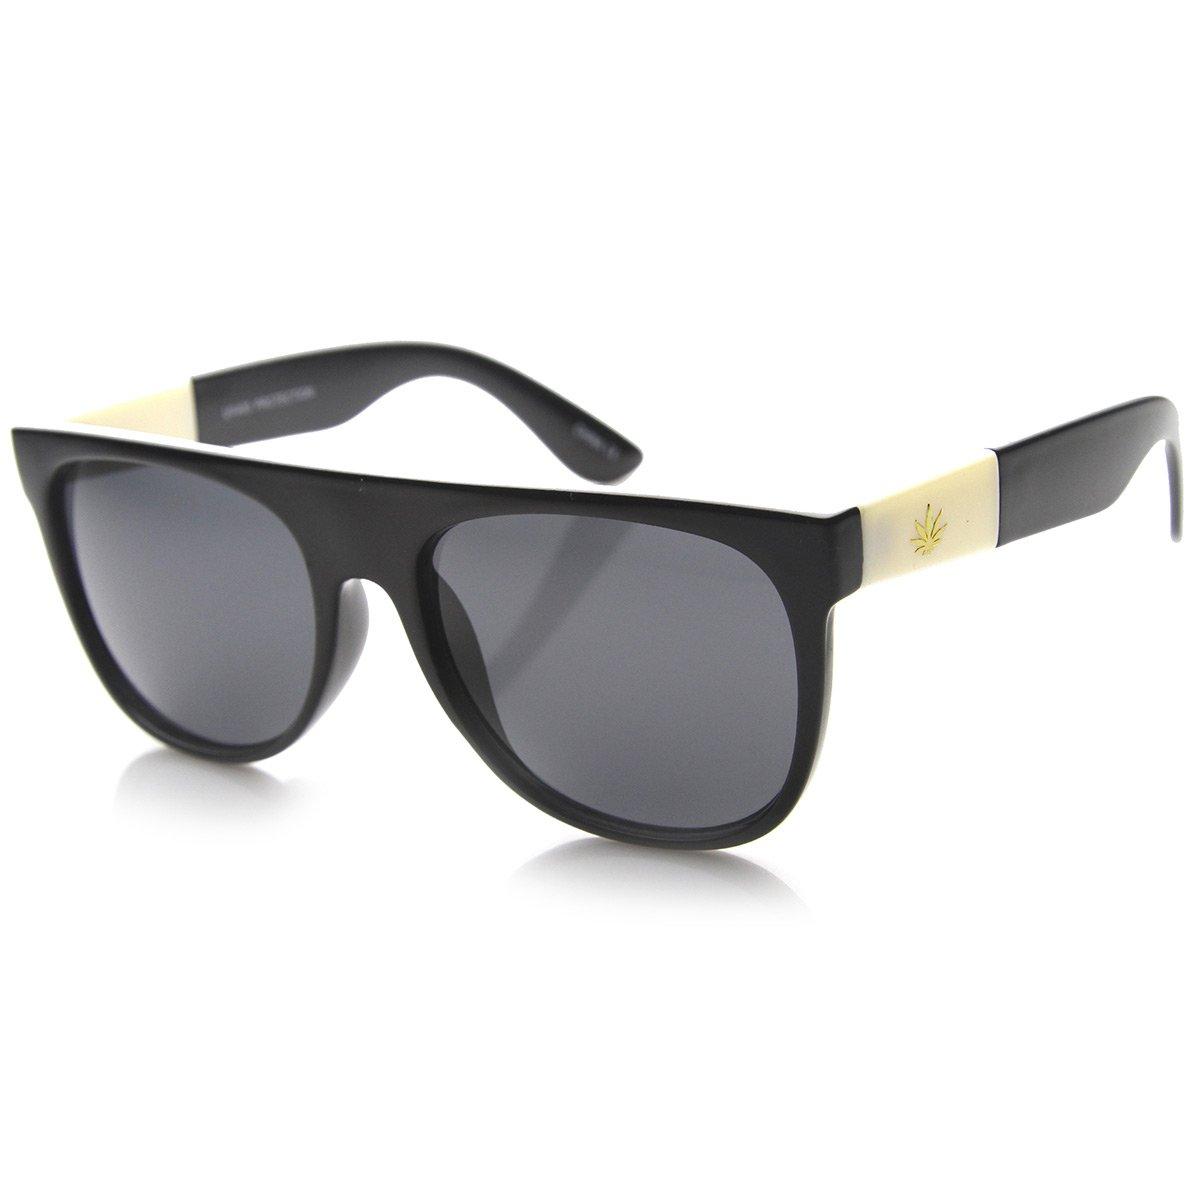 Retro Flat Top Gold Detailed Marijuana Weed Leaf Horn Rimmed Sunglasses (Ivory Leaf | Shiny Black/Smoke)